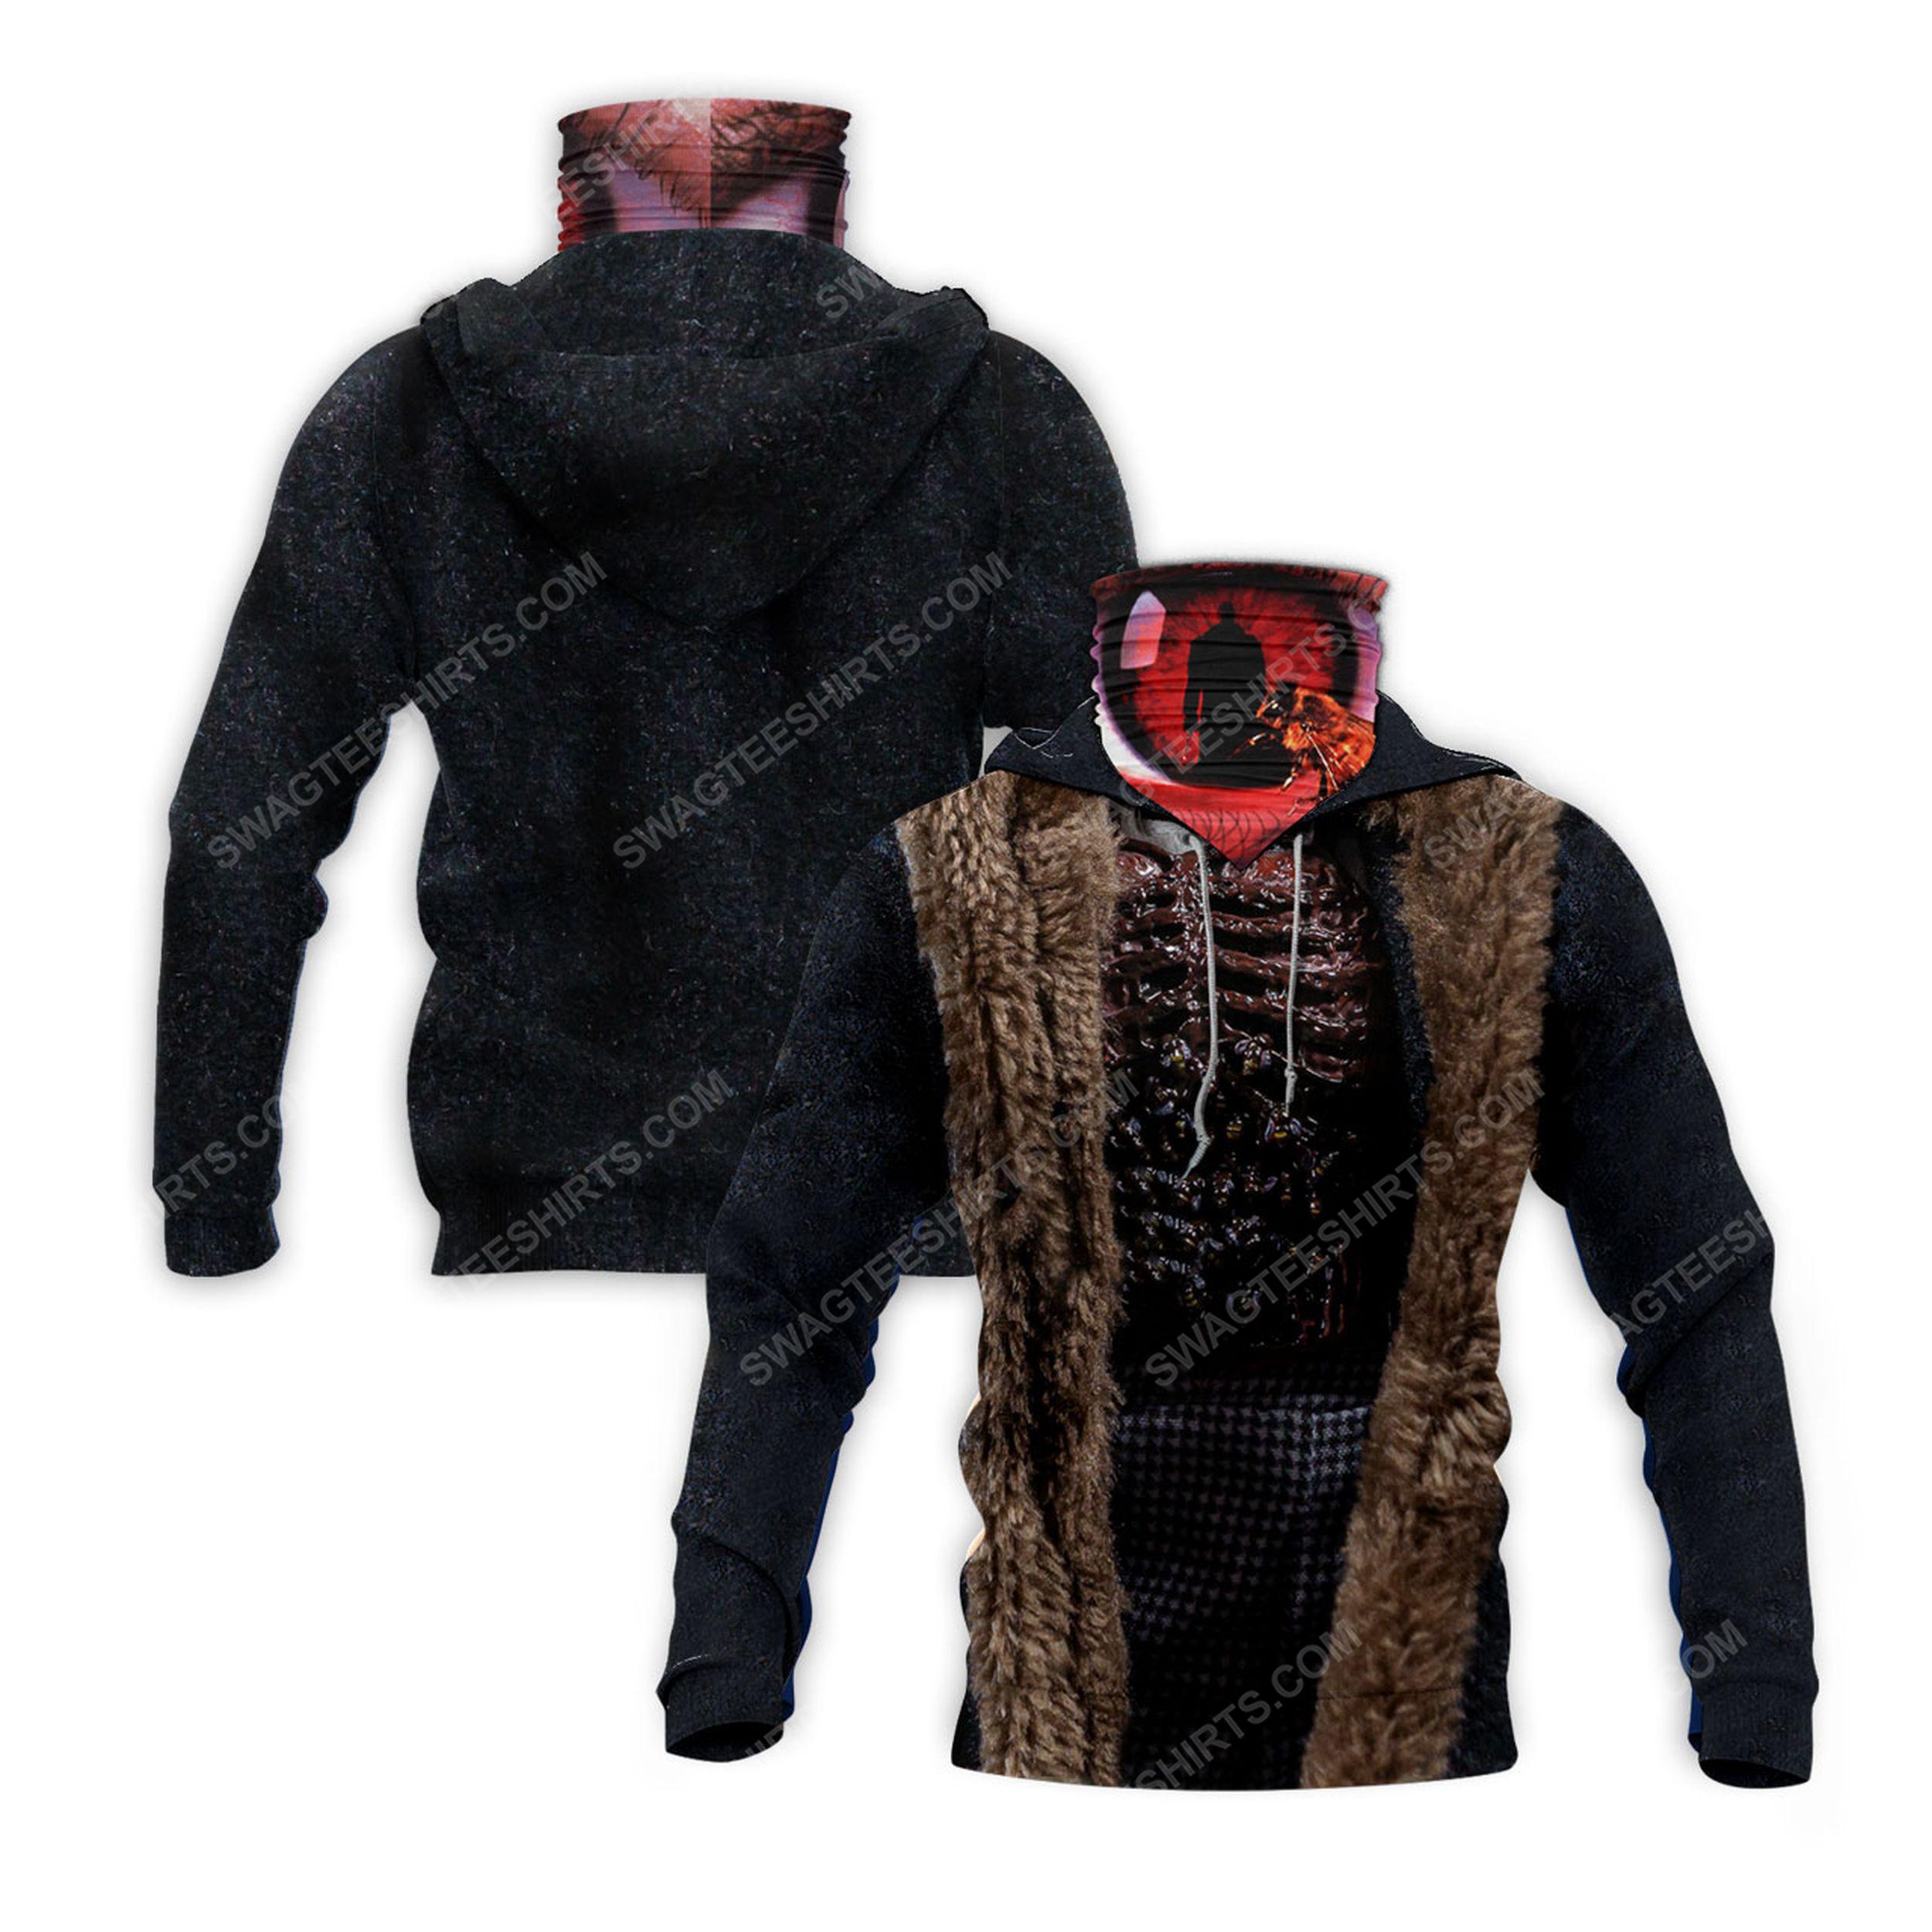 Horror movie candyman for halloween full print mask hoodie 2(1)